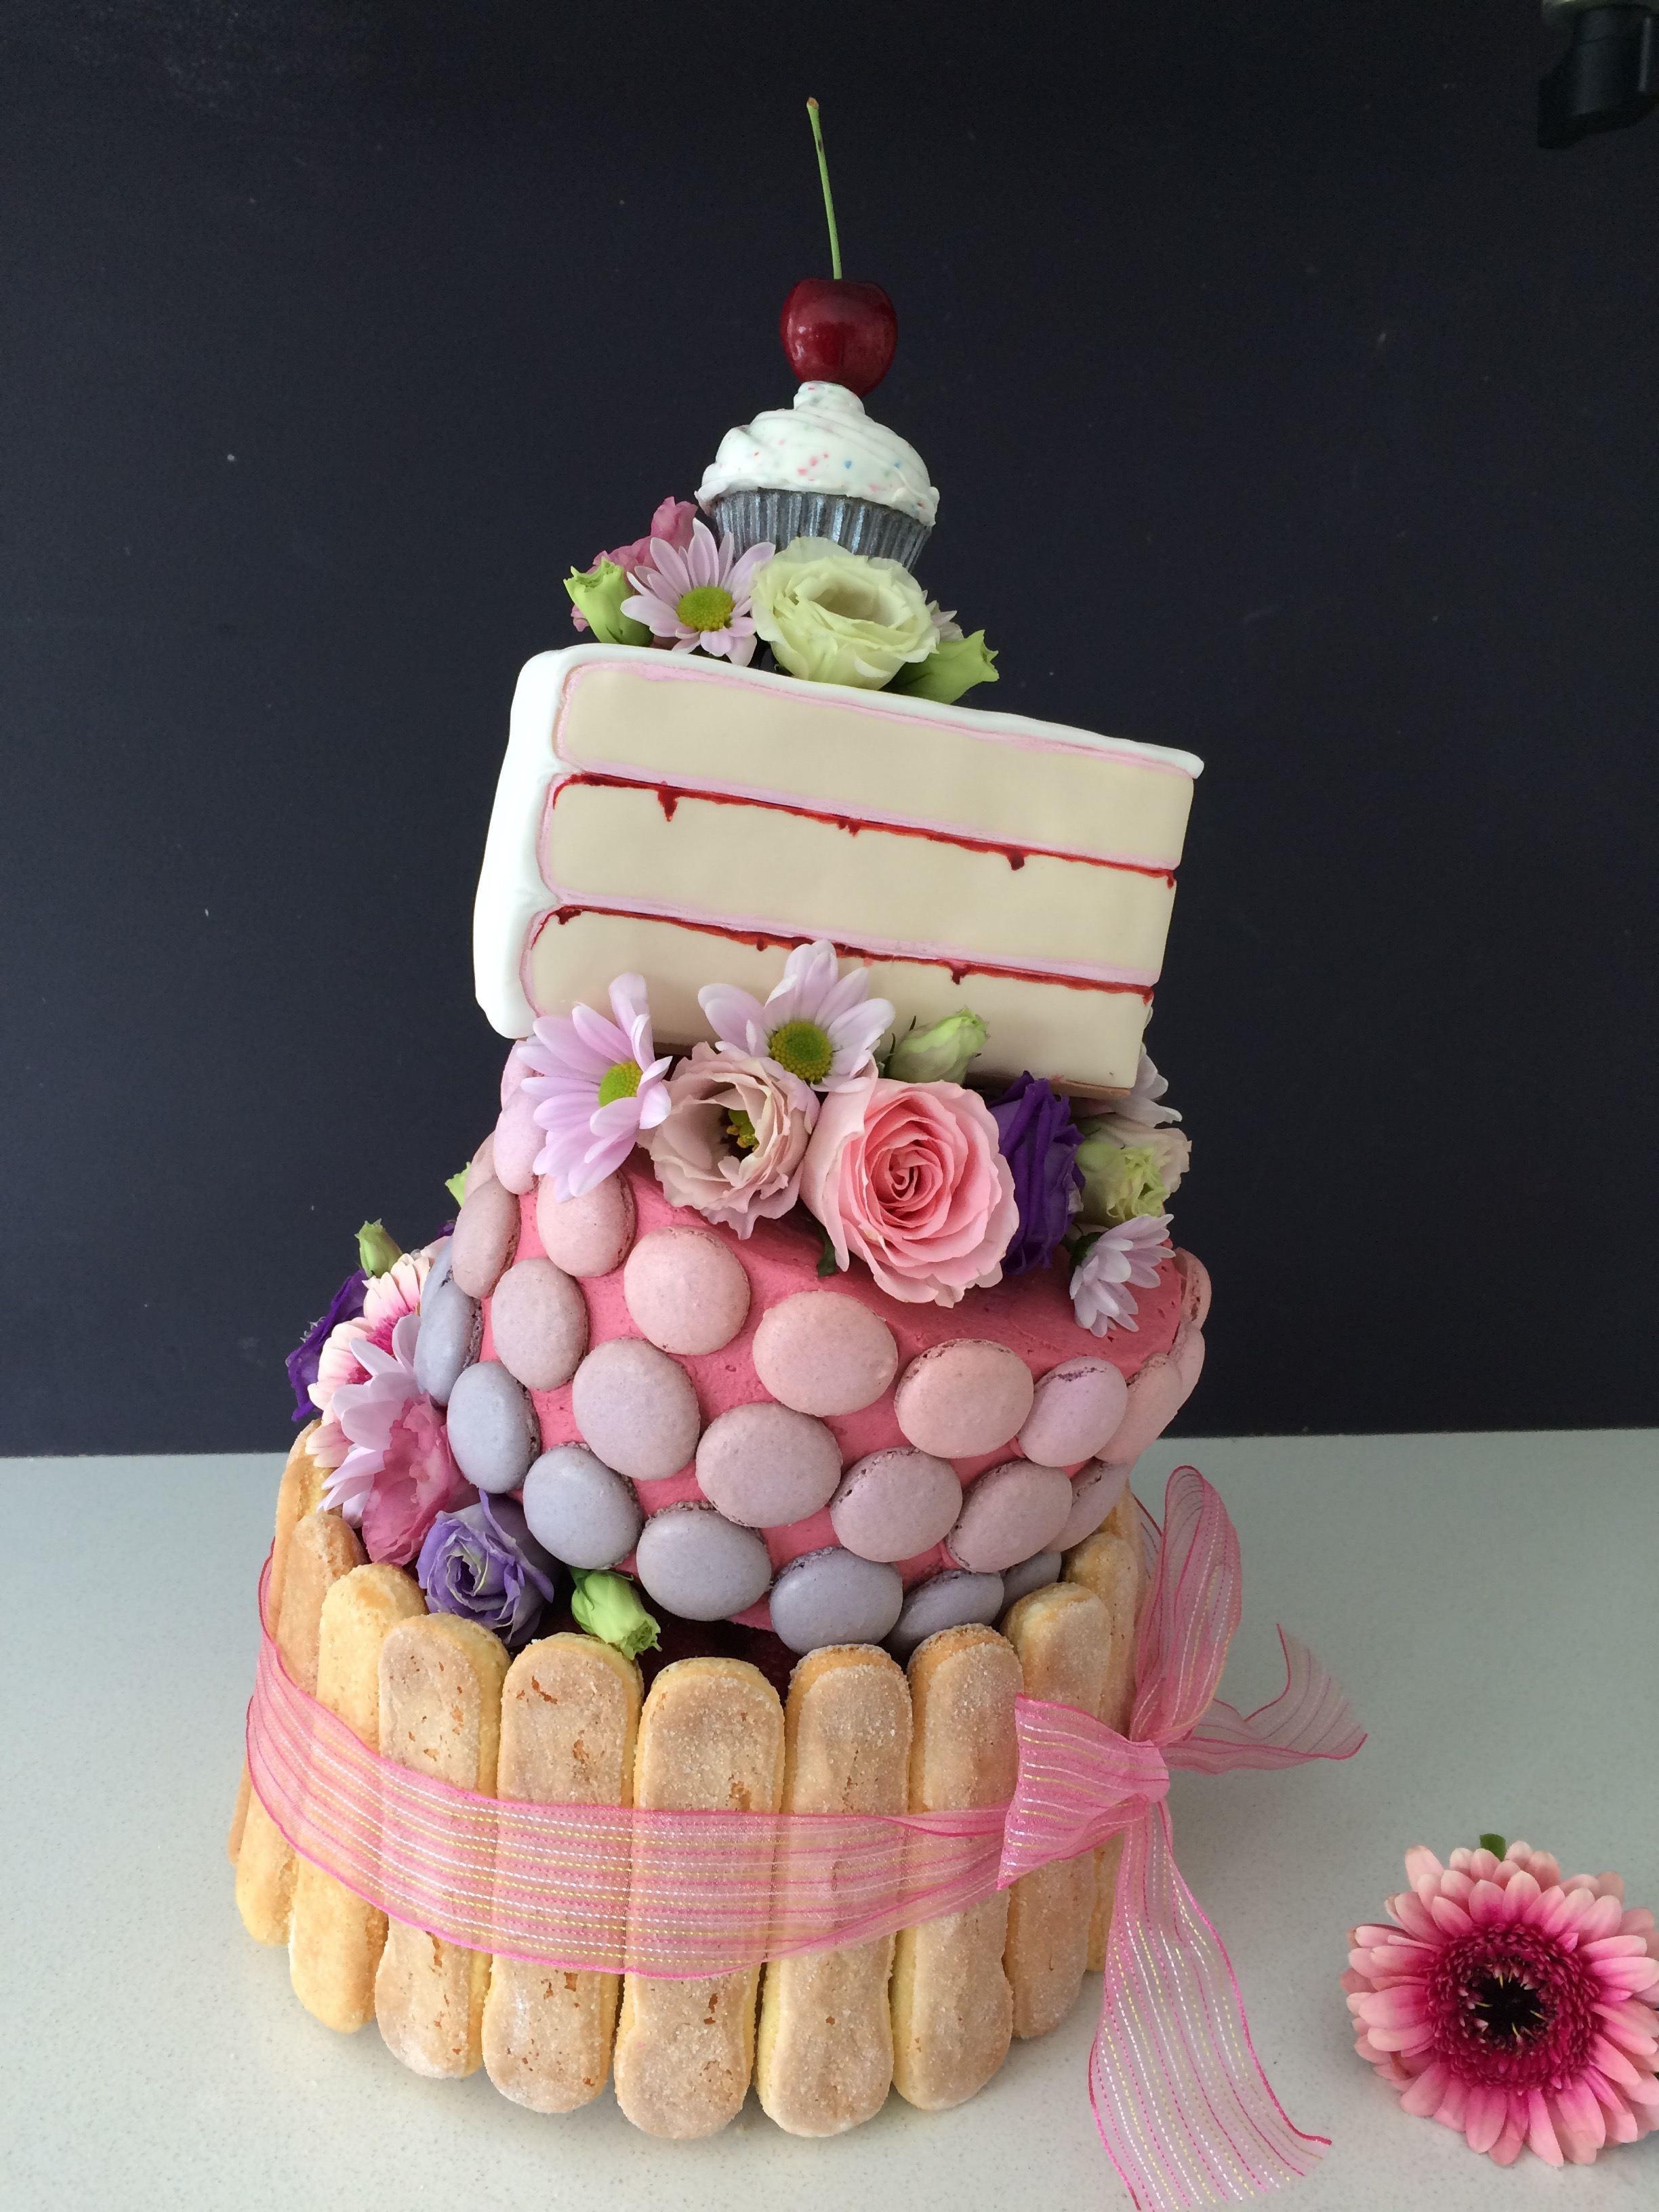 Topsy Turvy Hochzeitstorte  HowToCookThat Cakes Dessert & Chocolate